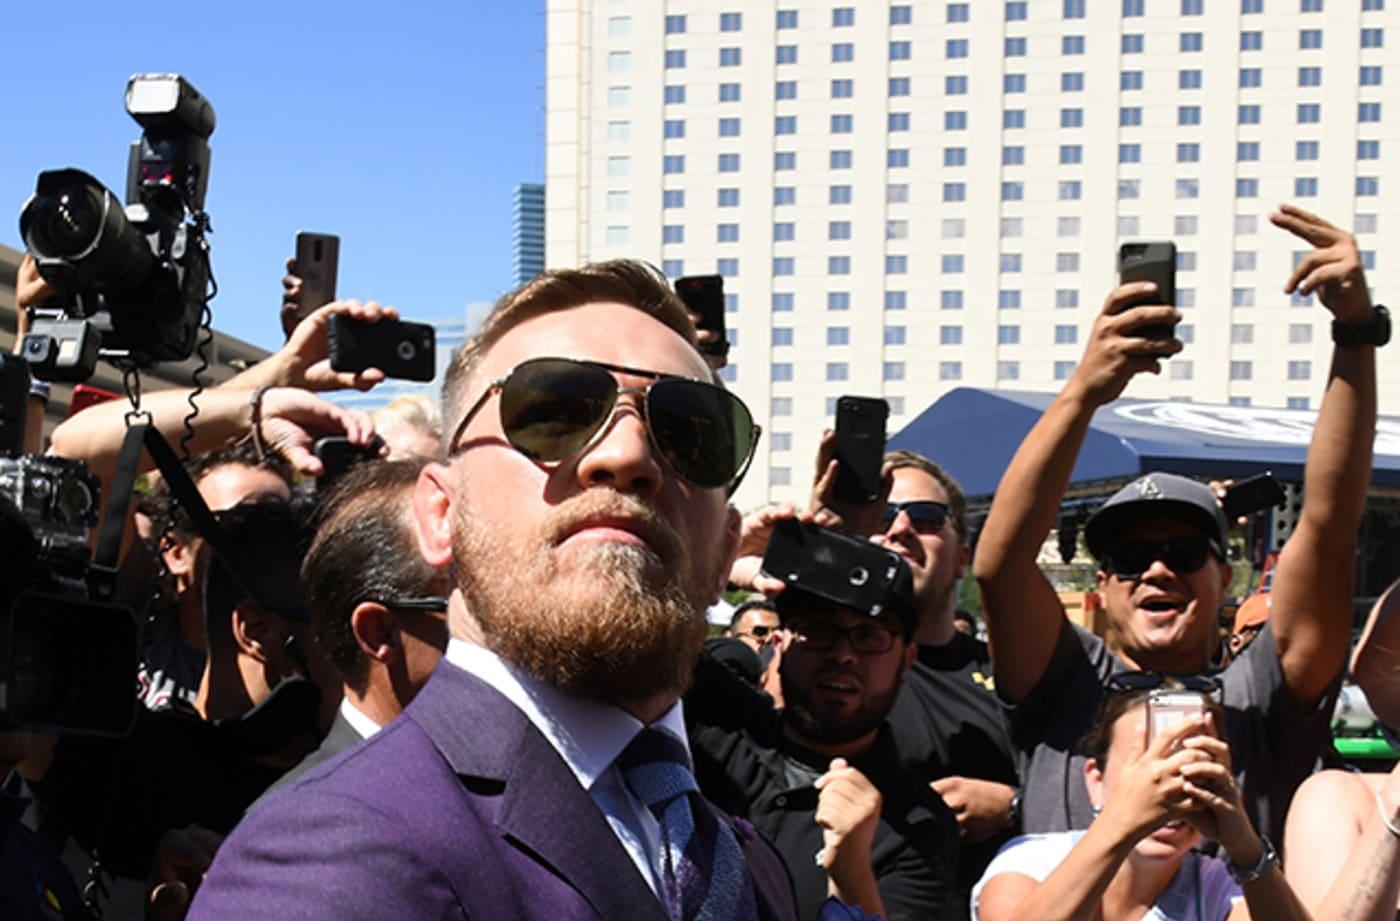 Conor McGregor arrives at Toshiba Plaza